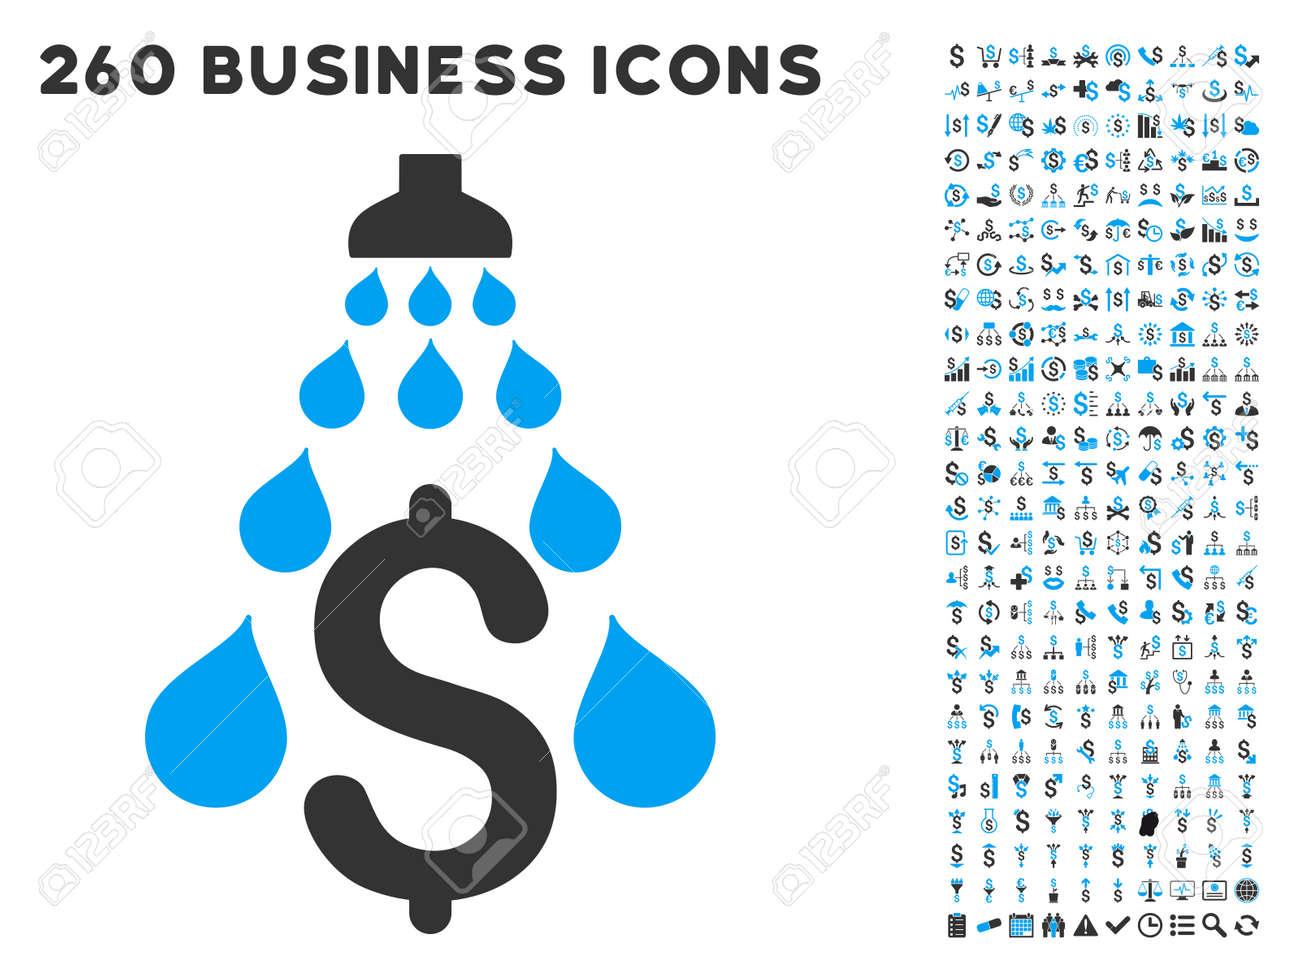 Money laundering icon within 260 vector business pictogram set money laundering icon within 260 vector business pictogram set style is bicolor flat symbols buycottarizona Images